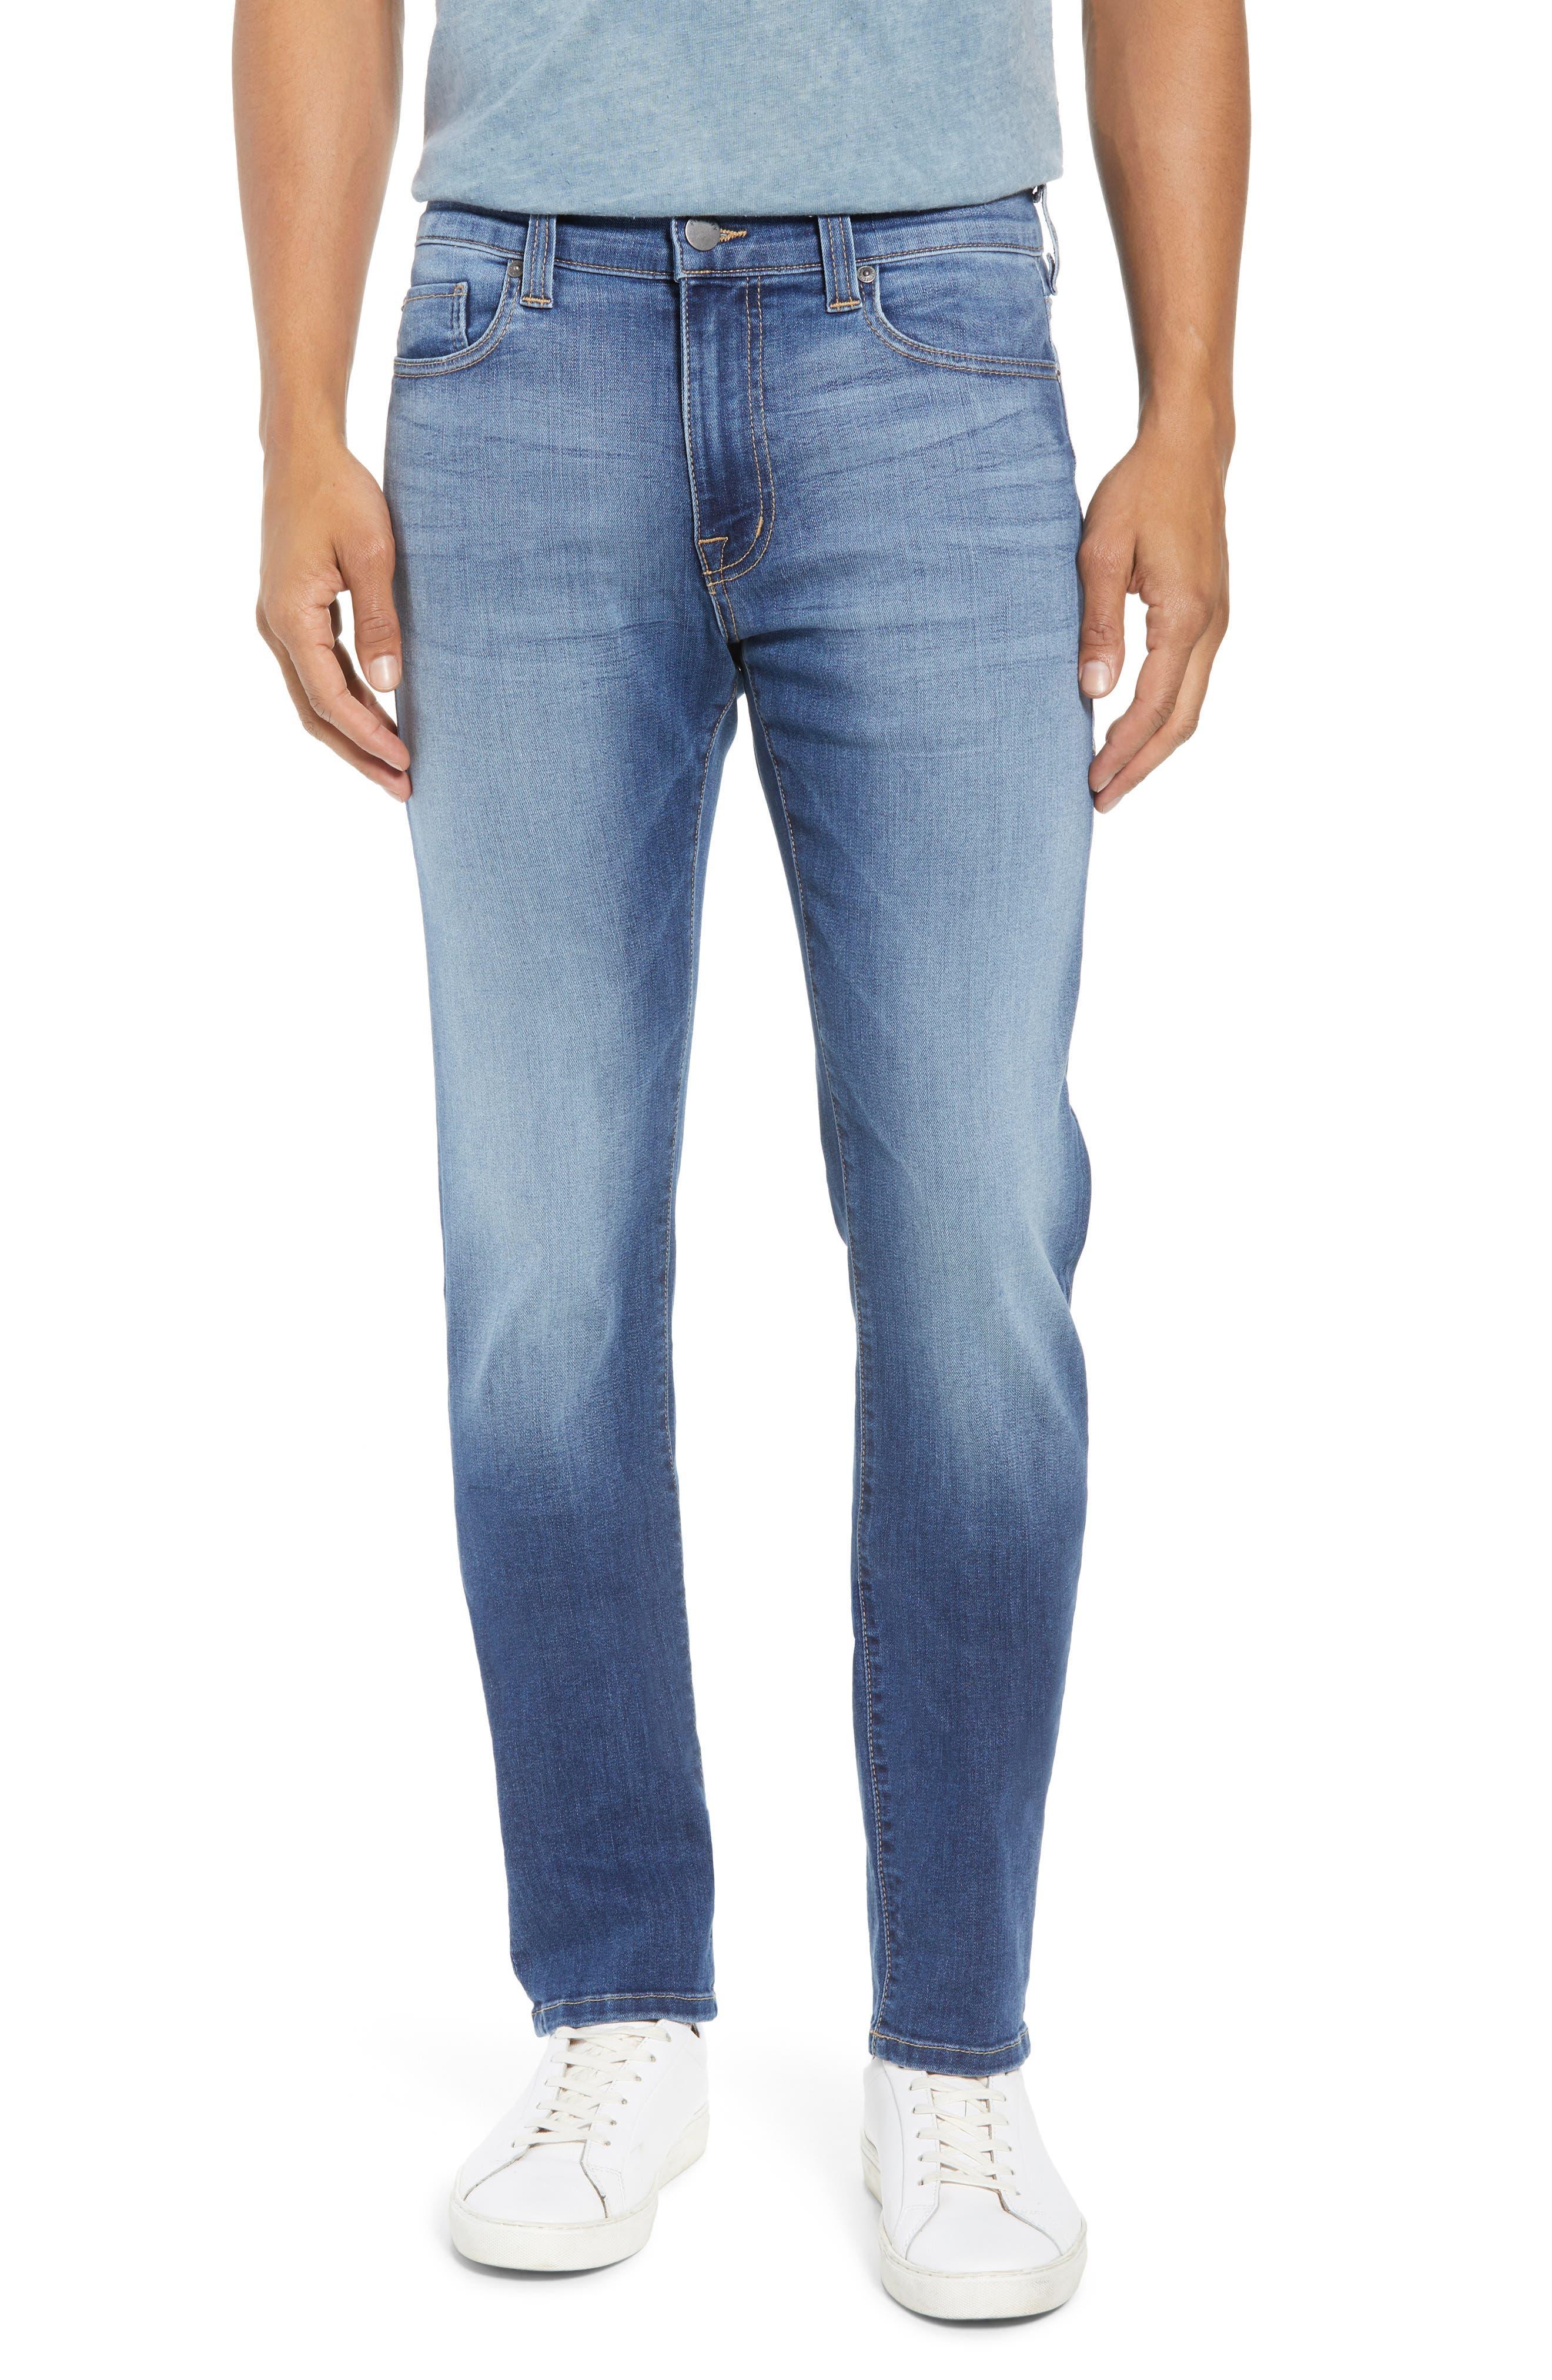 Torino Slim Fit Jeans,                             Main thumbnail 1, color,                             Elysium Blue